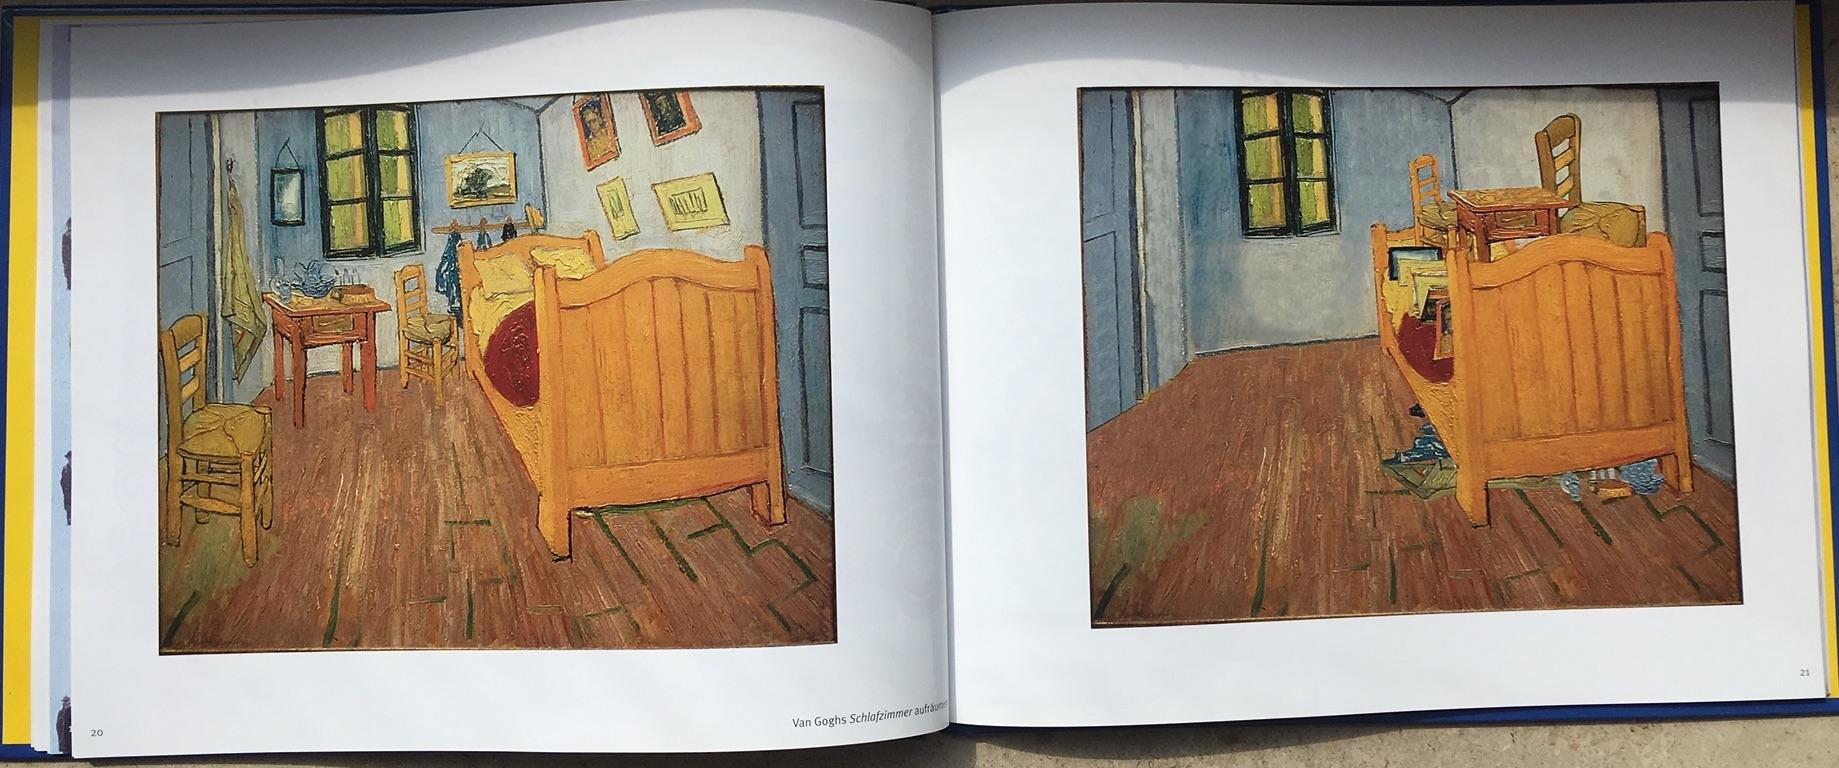 L'art en bazar-Van Gogh